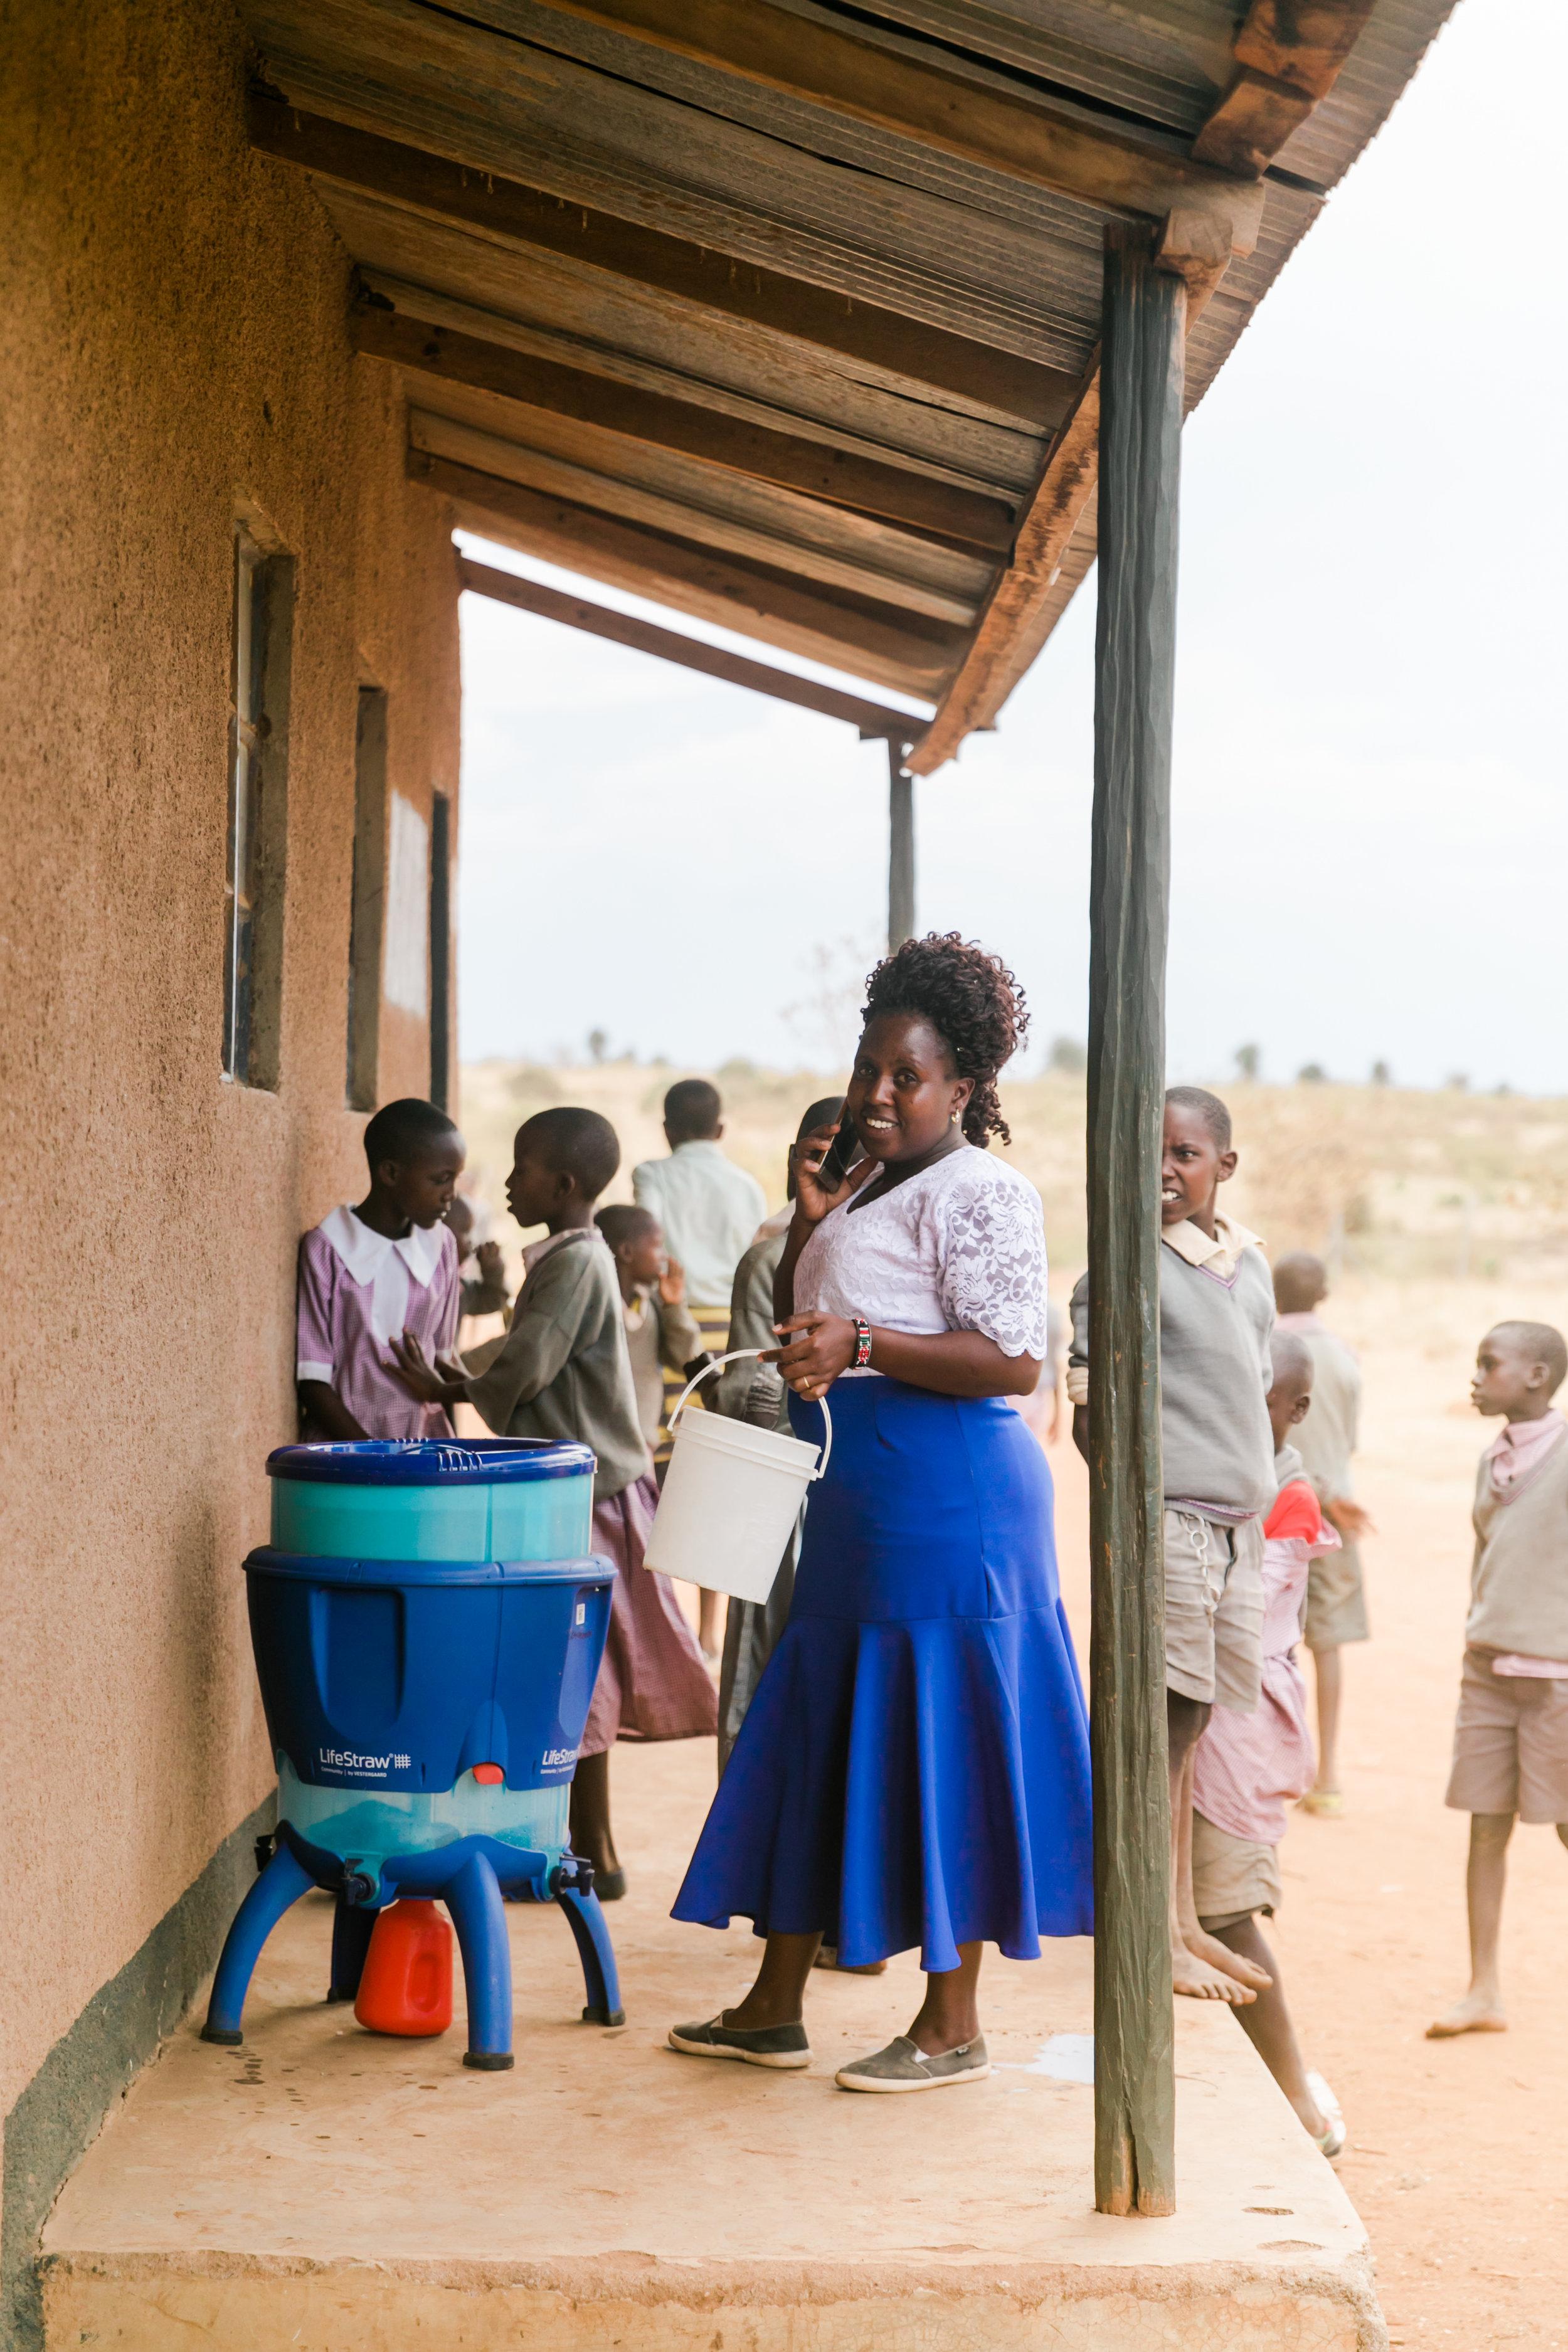 Maasai Mara School Visit - LifeStraw Water Ph. Valorie Darling